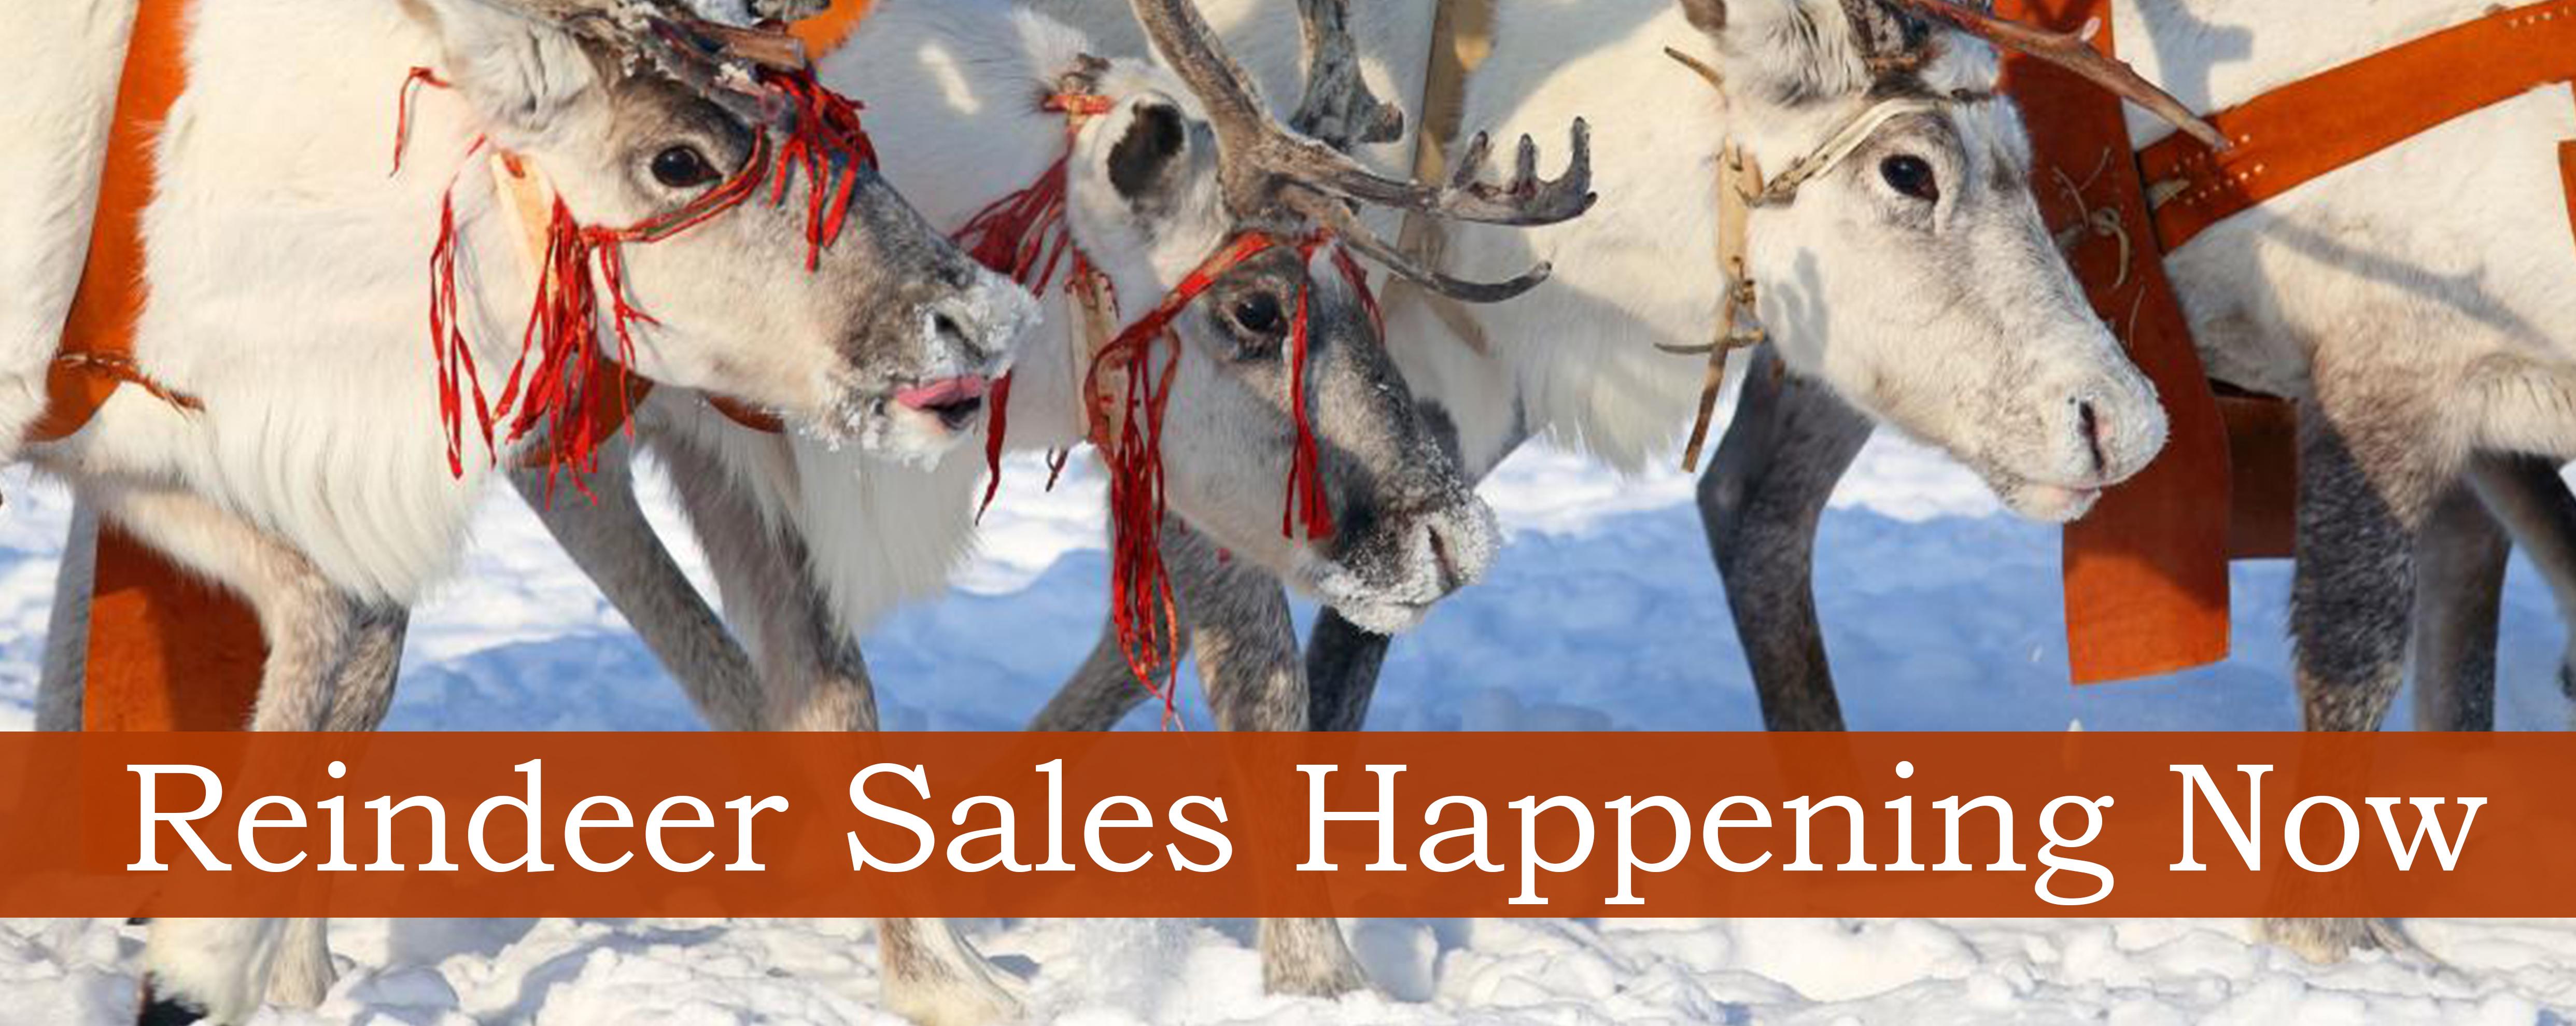 facebook-banner-reindeer-sales-4